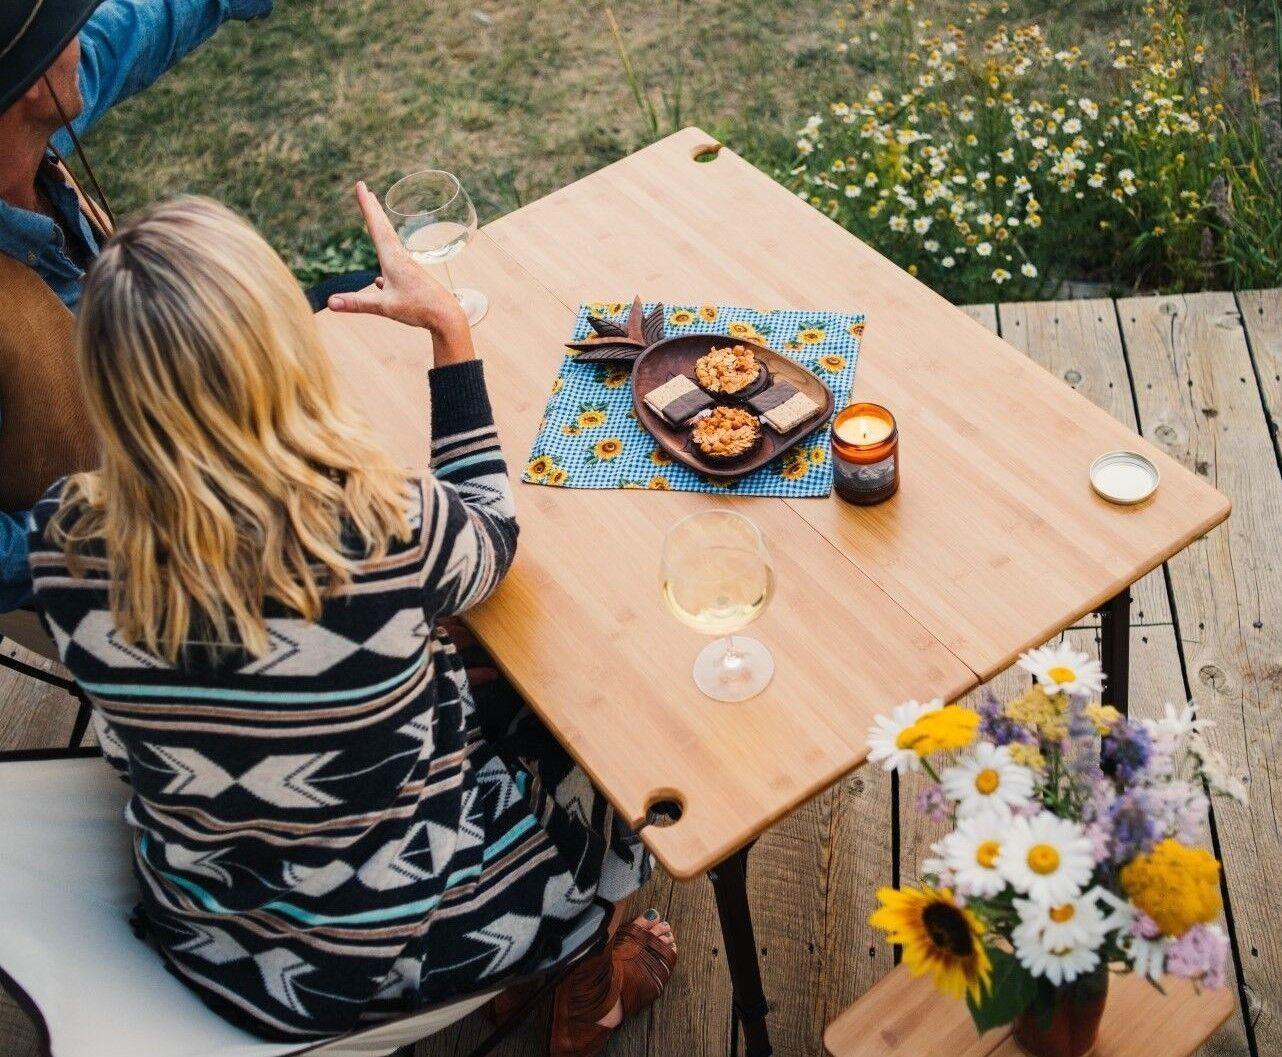 TravelChair Kanpai BAMBOO TABLE WINE GLASS HOLDER FOLDING PORTABLE WOOD LUXURY